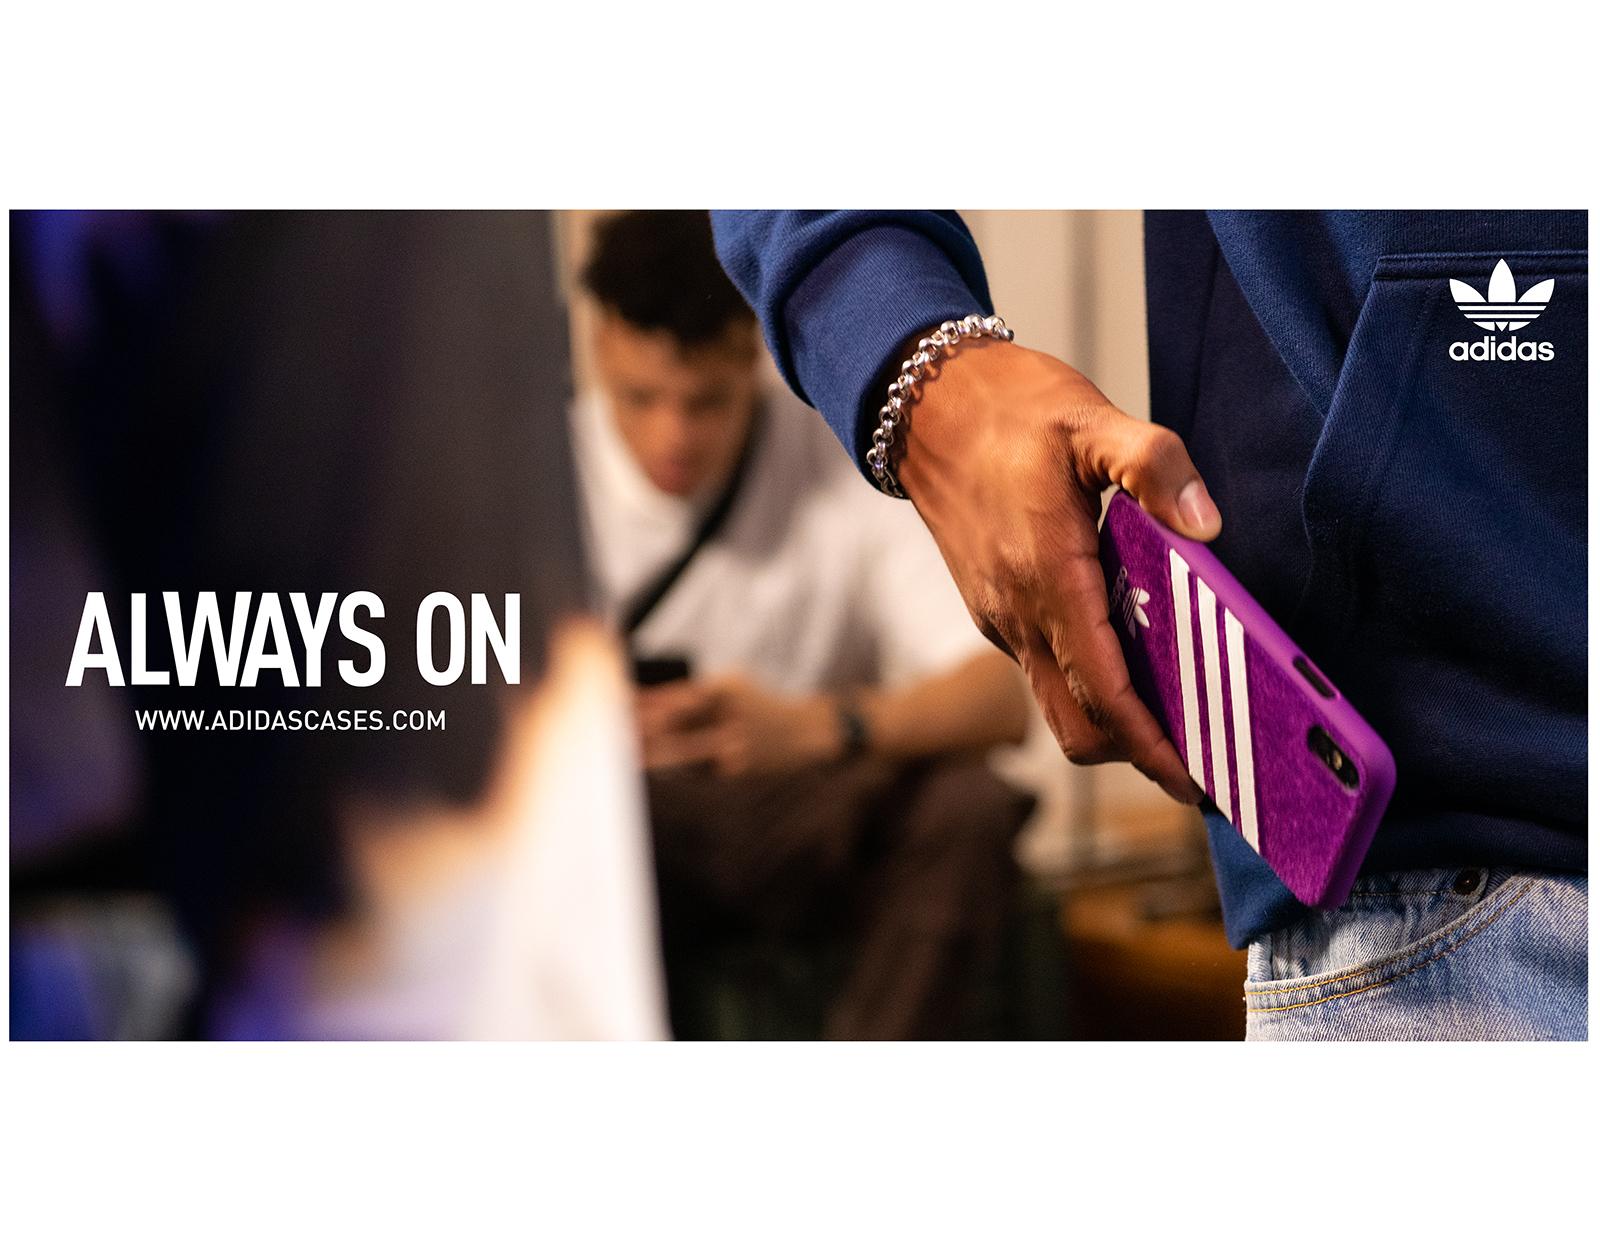 ASS_adidas_Always On 02.jpg